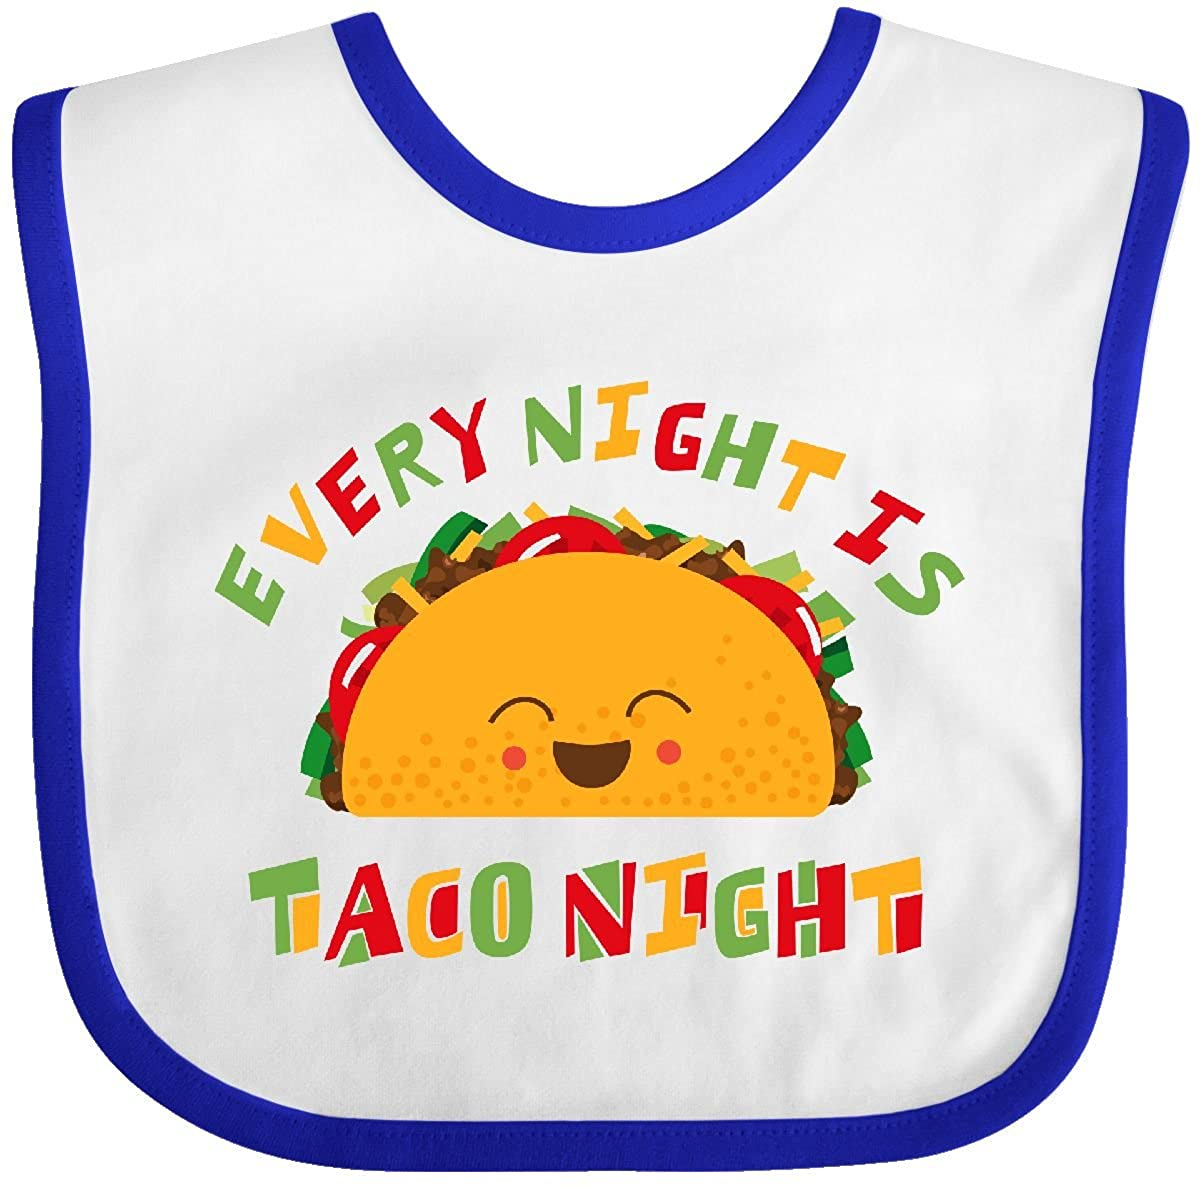 Inktastic - Tacos Every Night Baby Bib 2f768 14-194408-116-893-2993